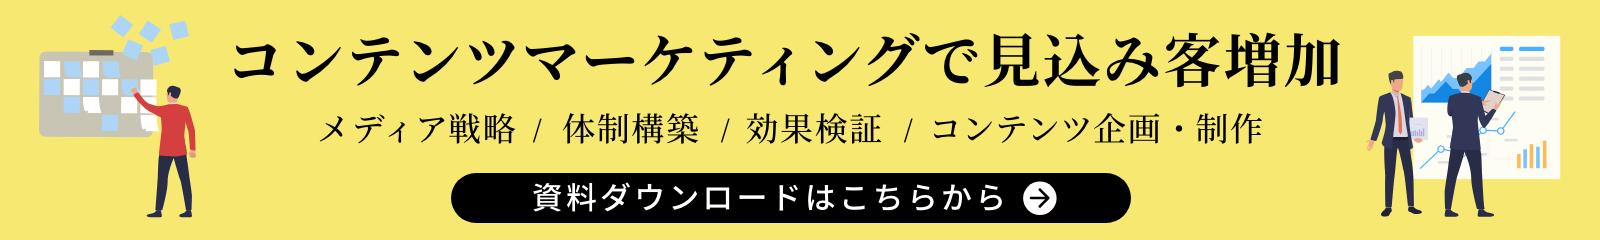 banner_yellow01